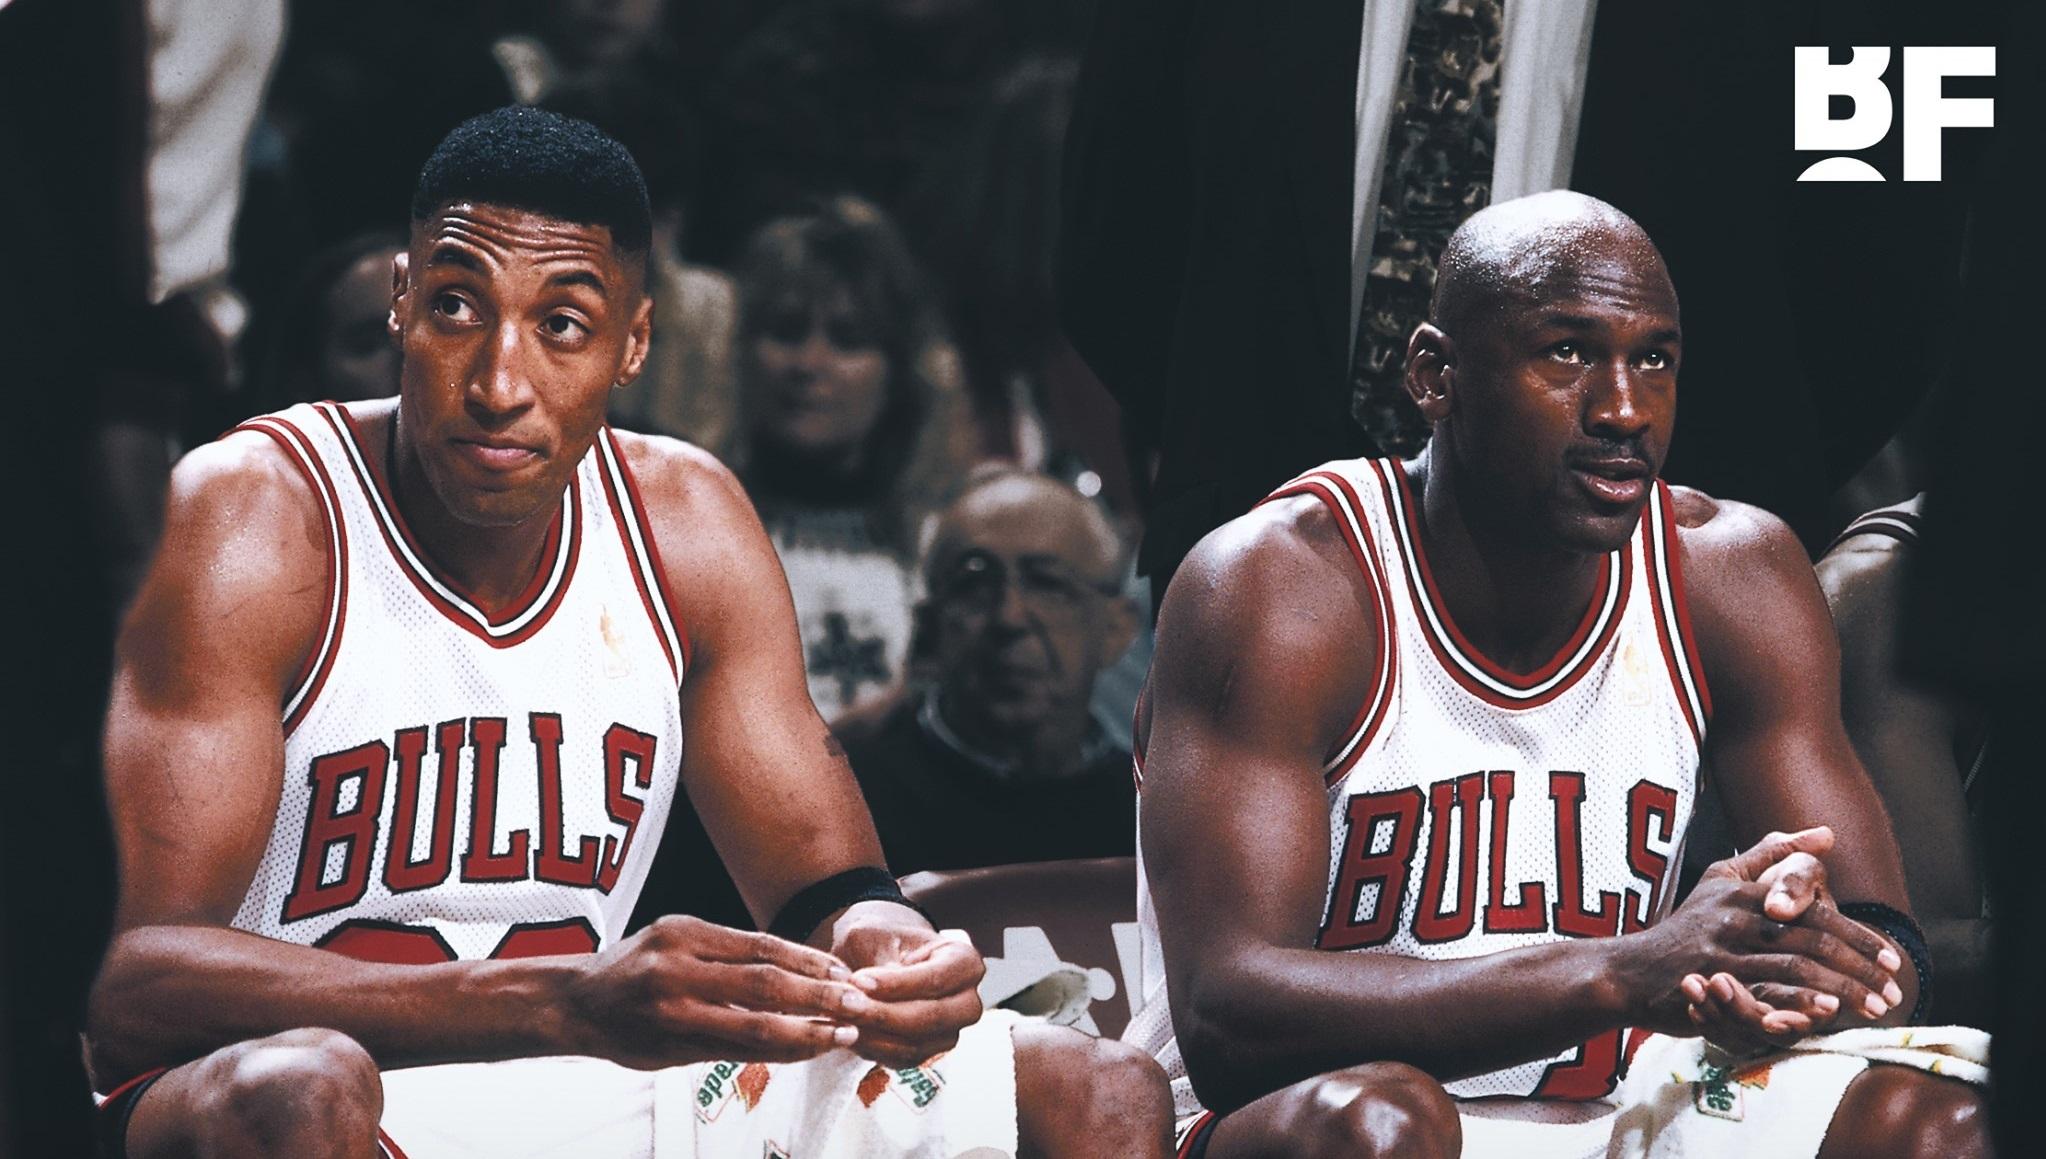 Scottie Pippen Takes Jabs at Michael Jordan in New Release Full of Untold Stories